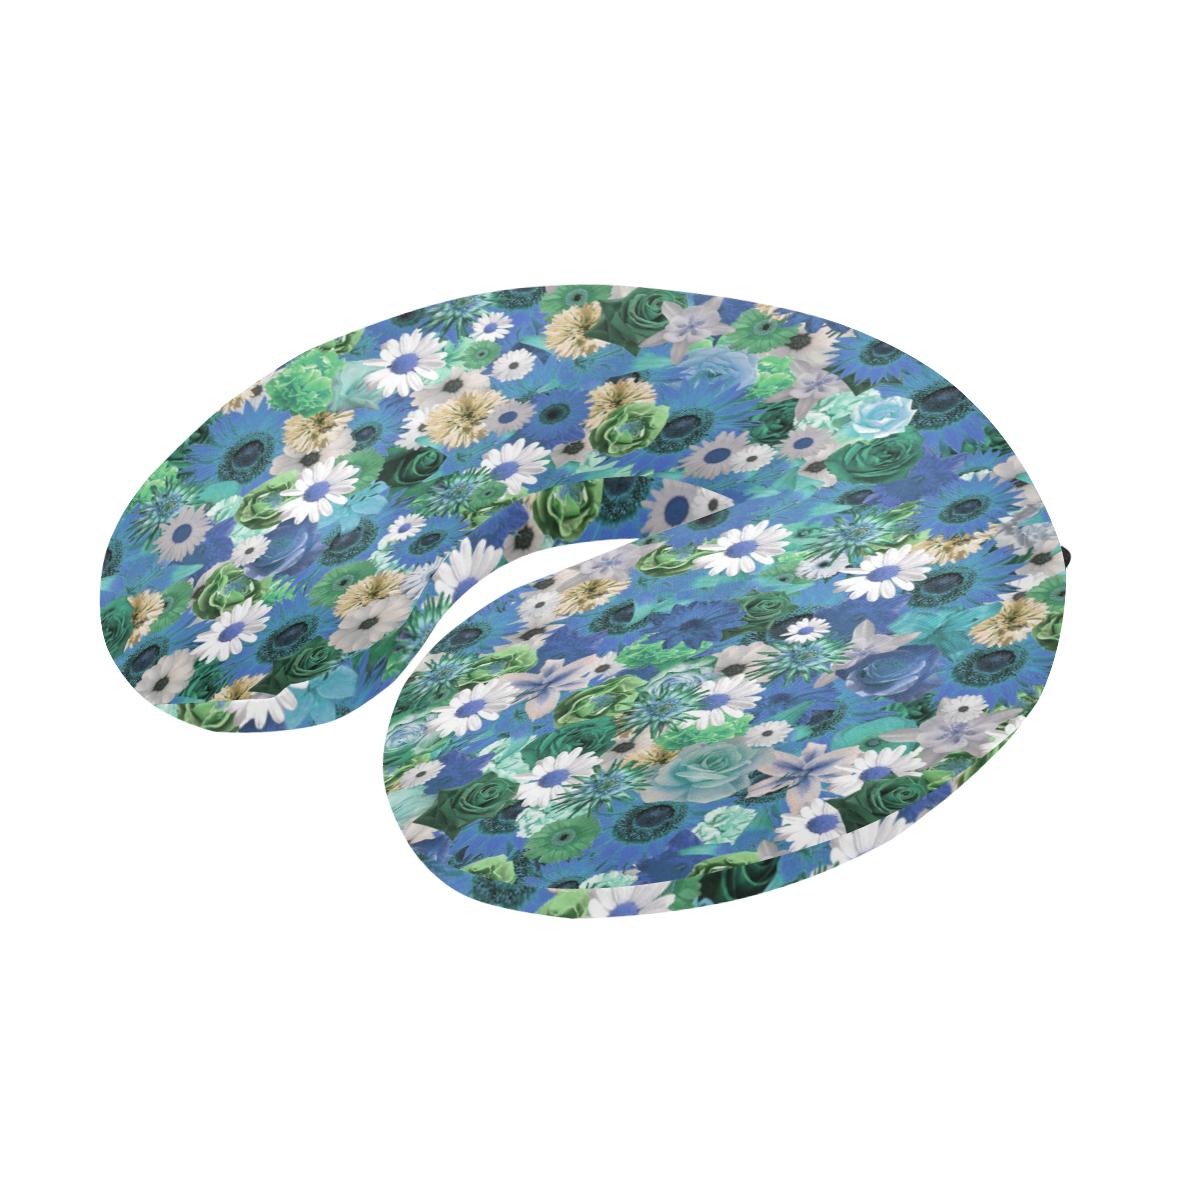 Turquoise Gold Fantasy Garden U-Shape Travel Pillow